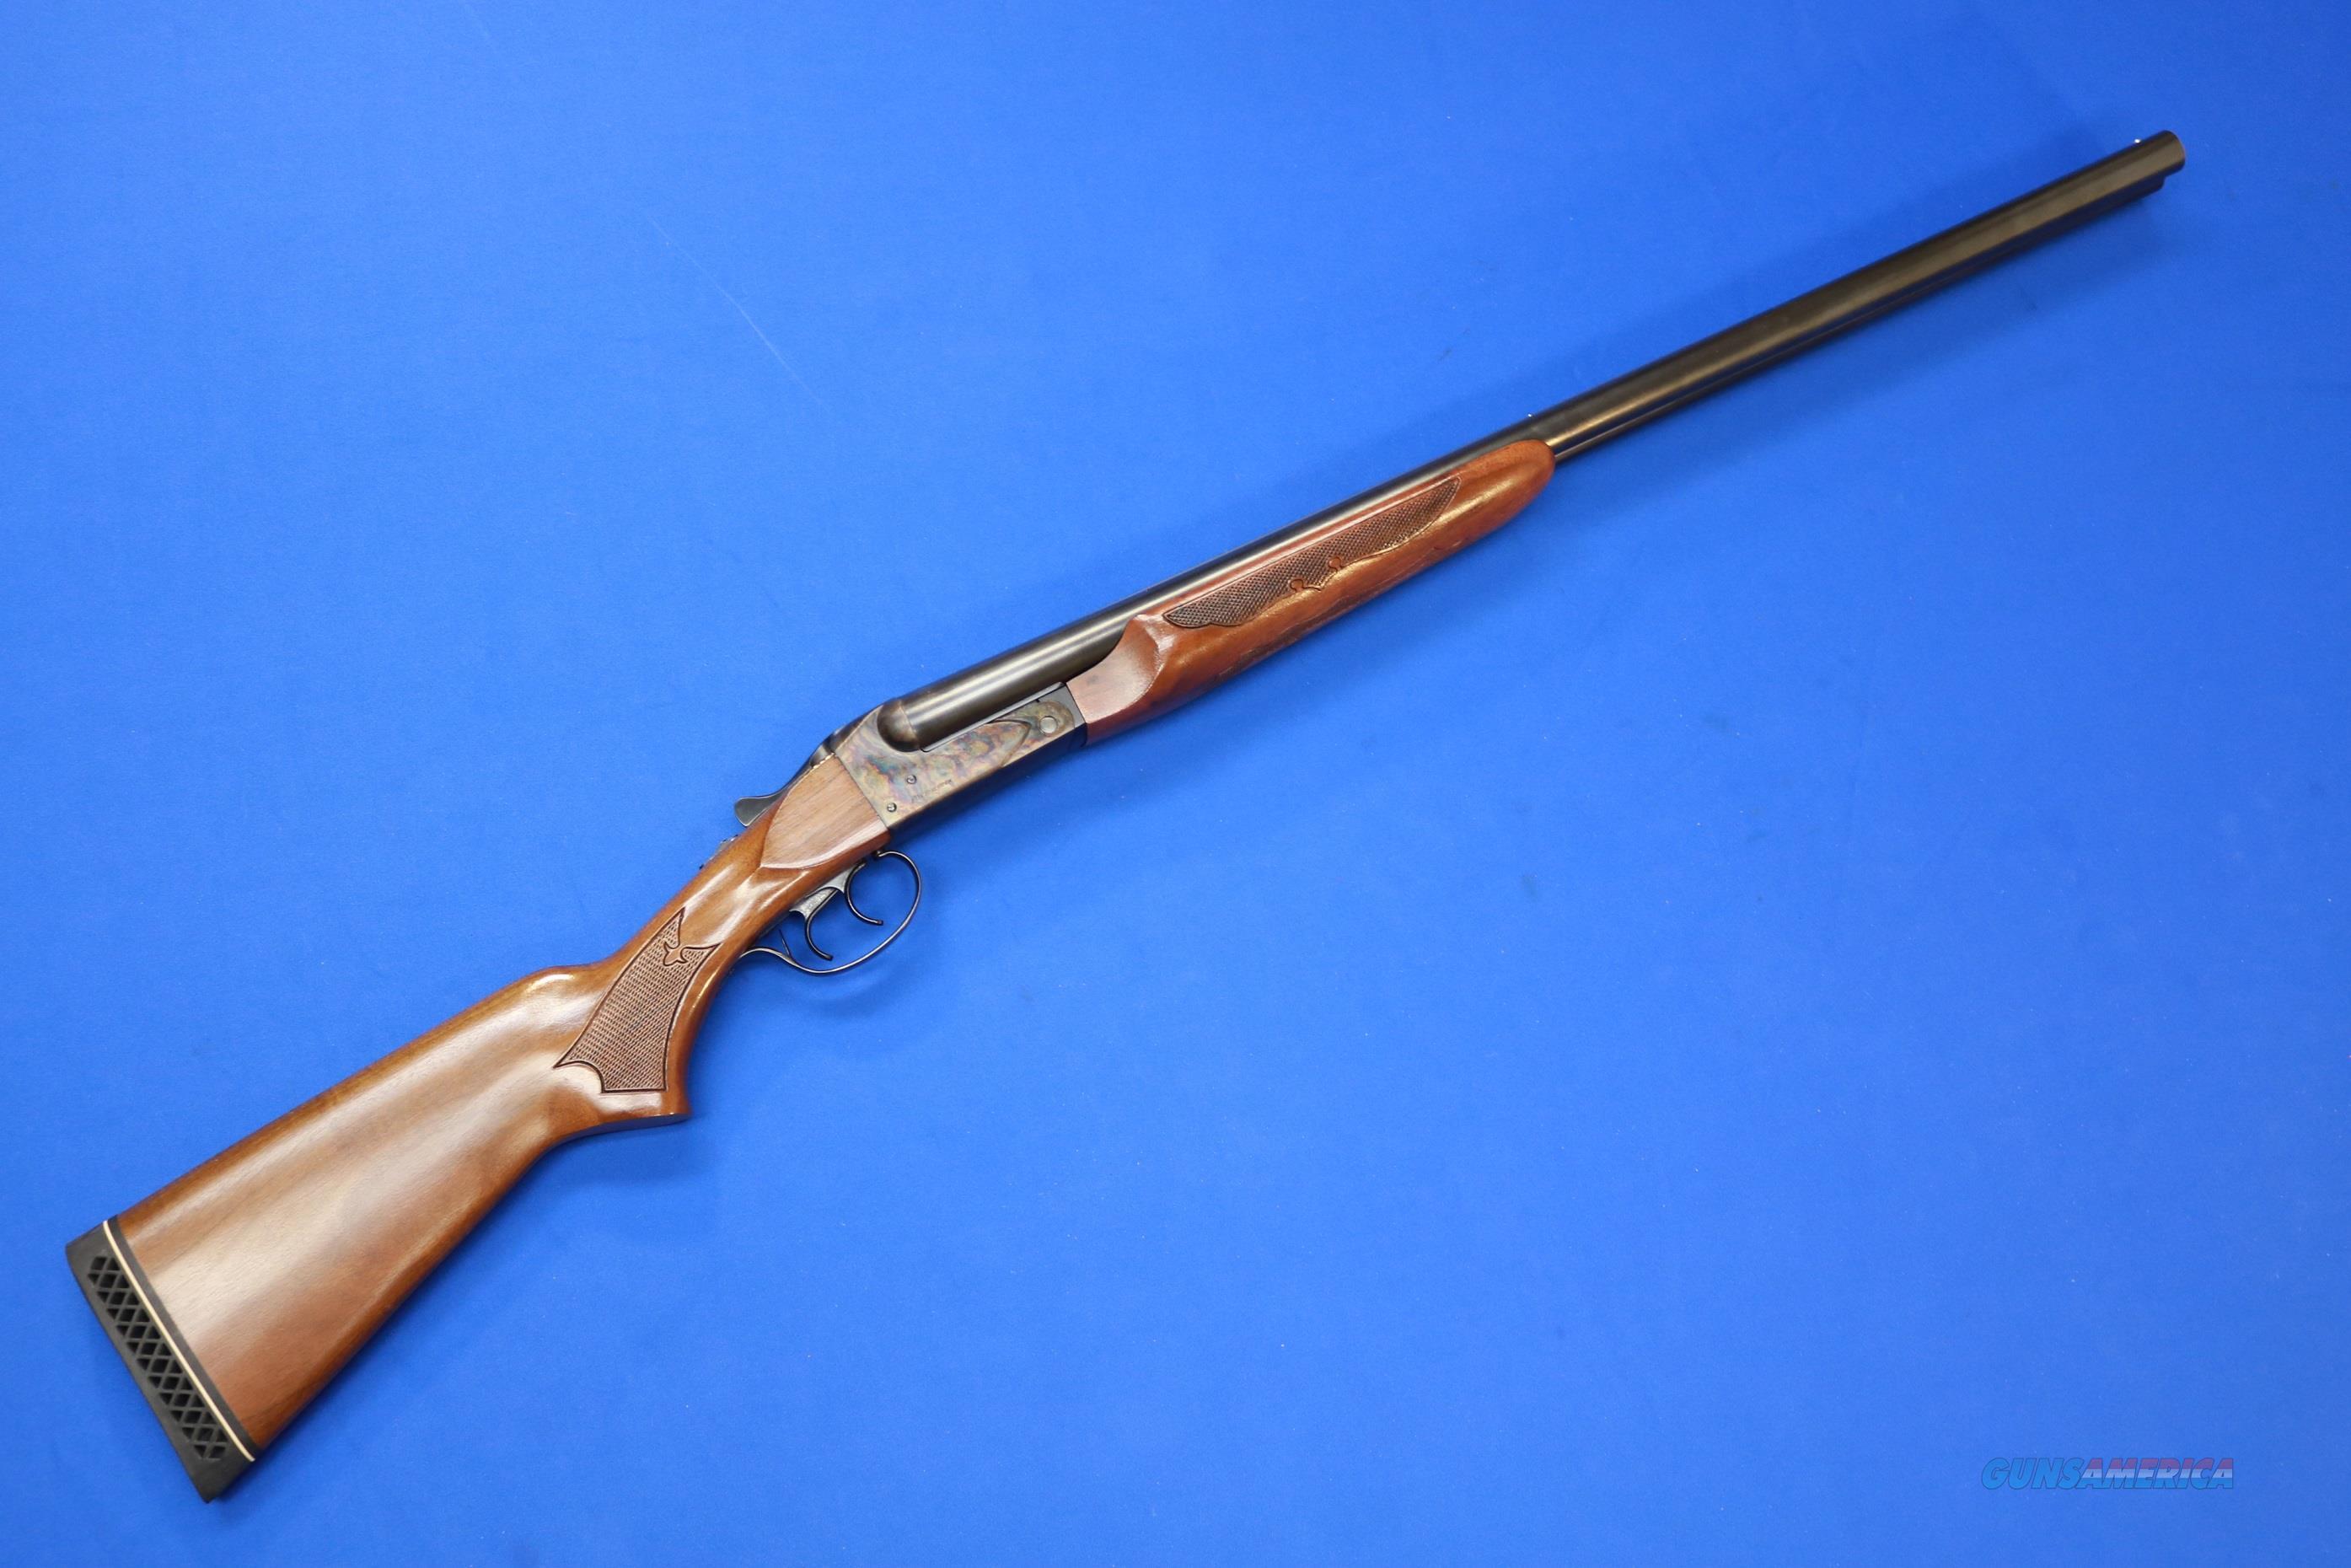 "SAVAGE FOX MODEL B SxS SHOTGUN 12 GA 28""  Guns > Shotguns > Savage Shotguns"